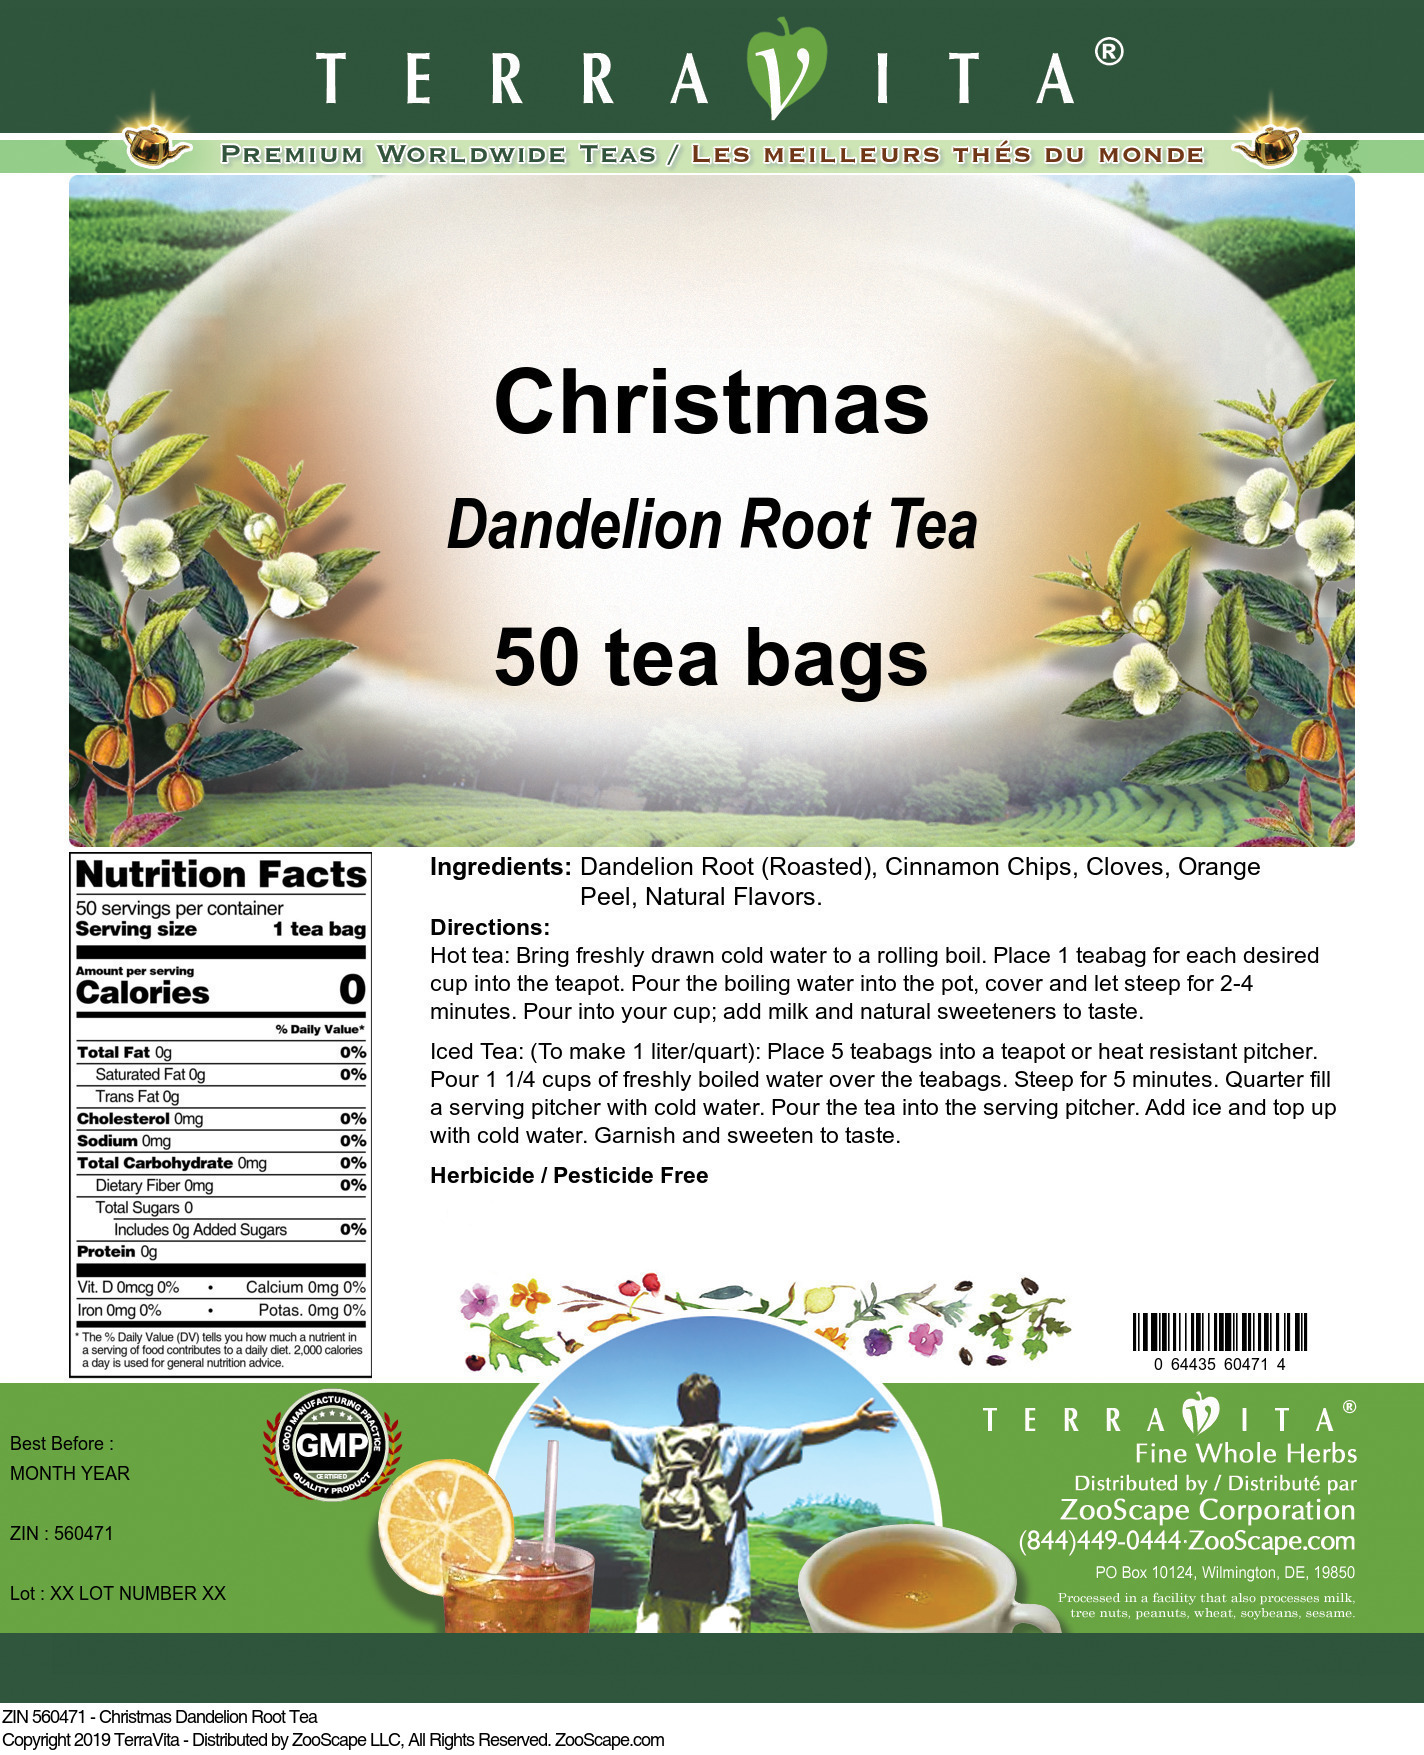 Christmas Dandelion Root Tea